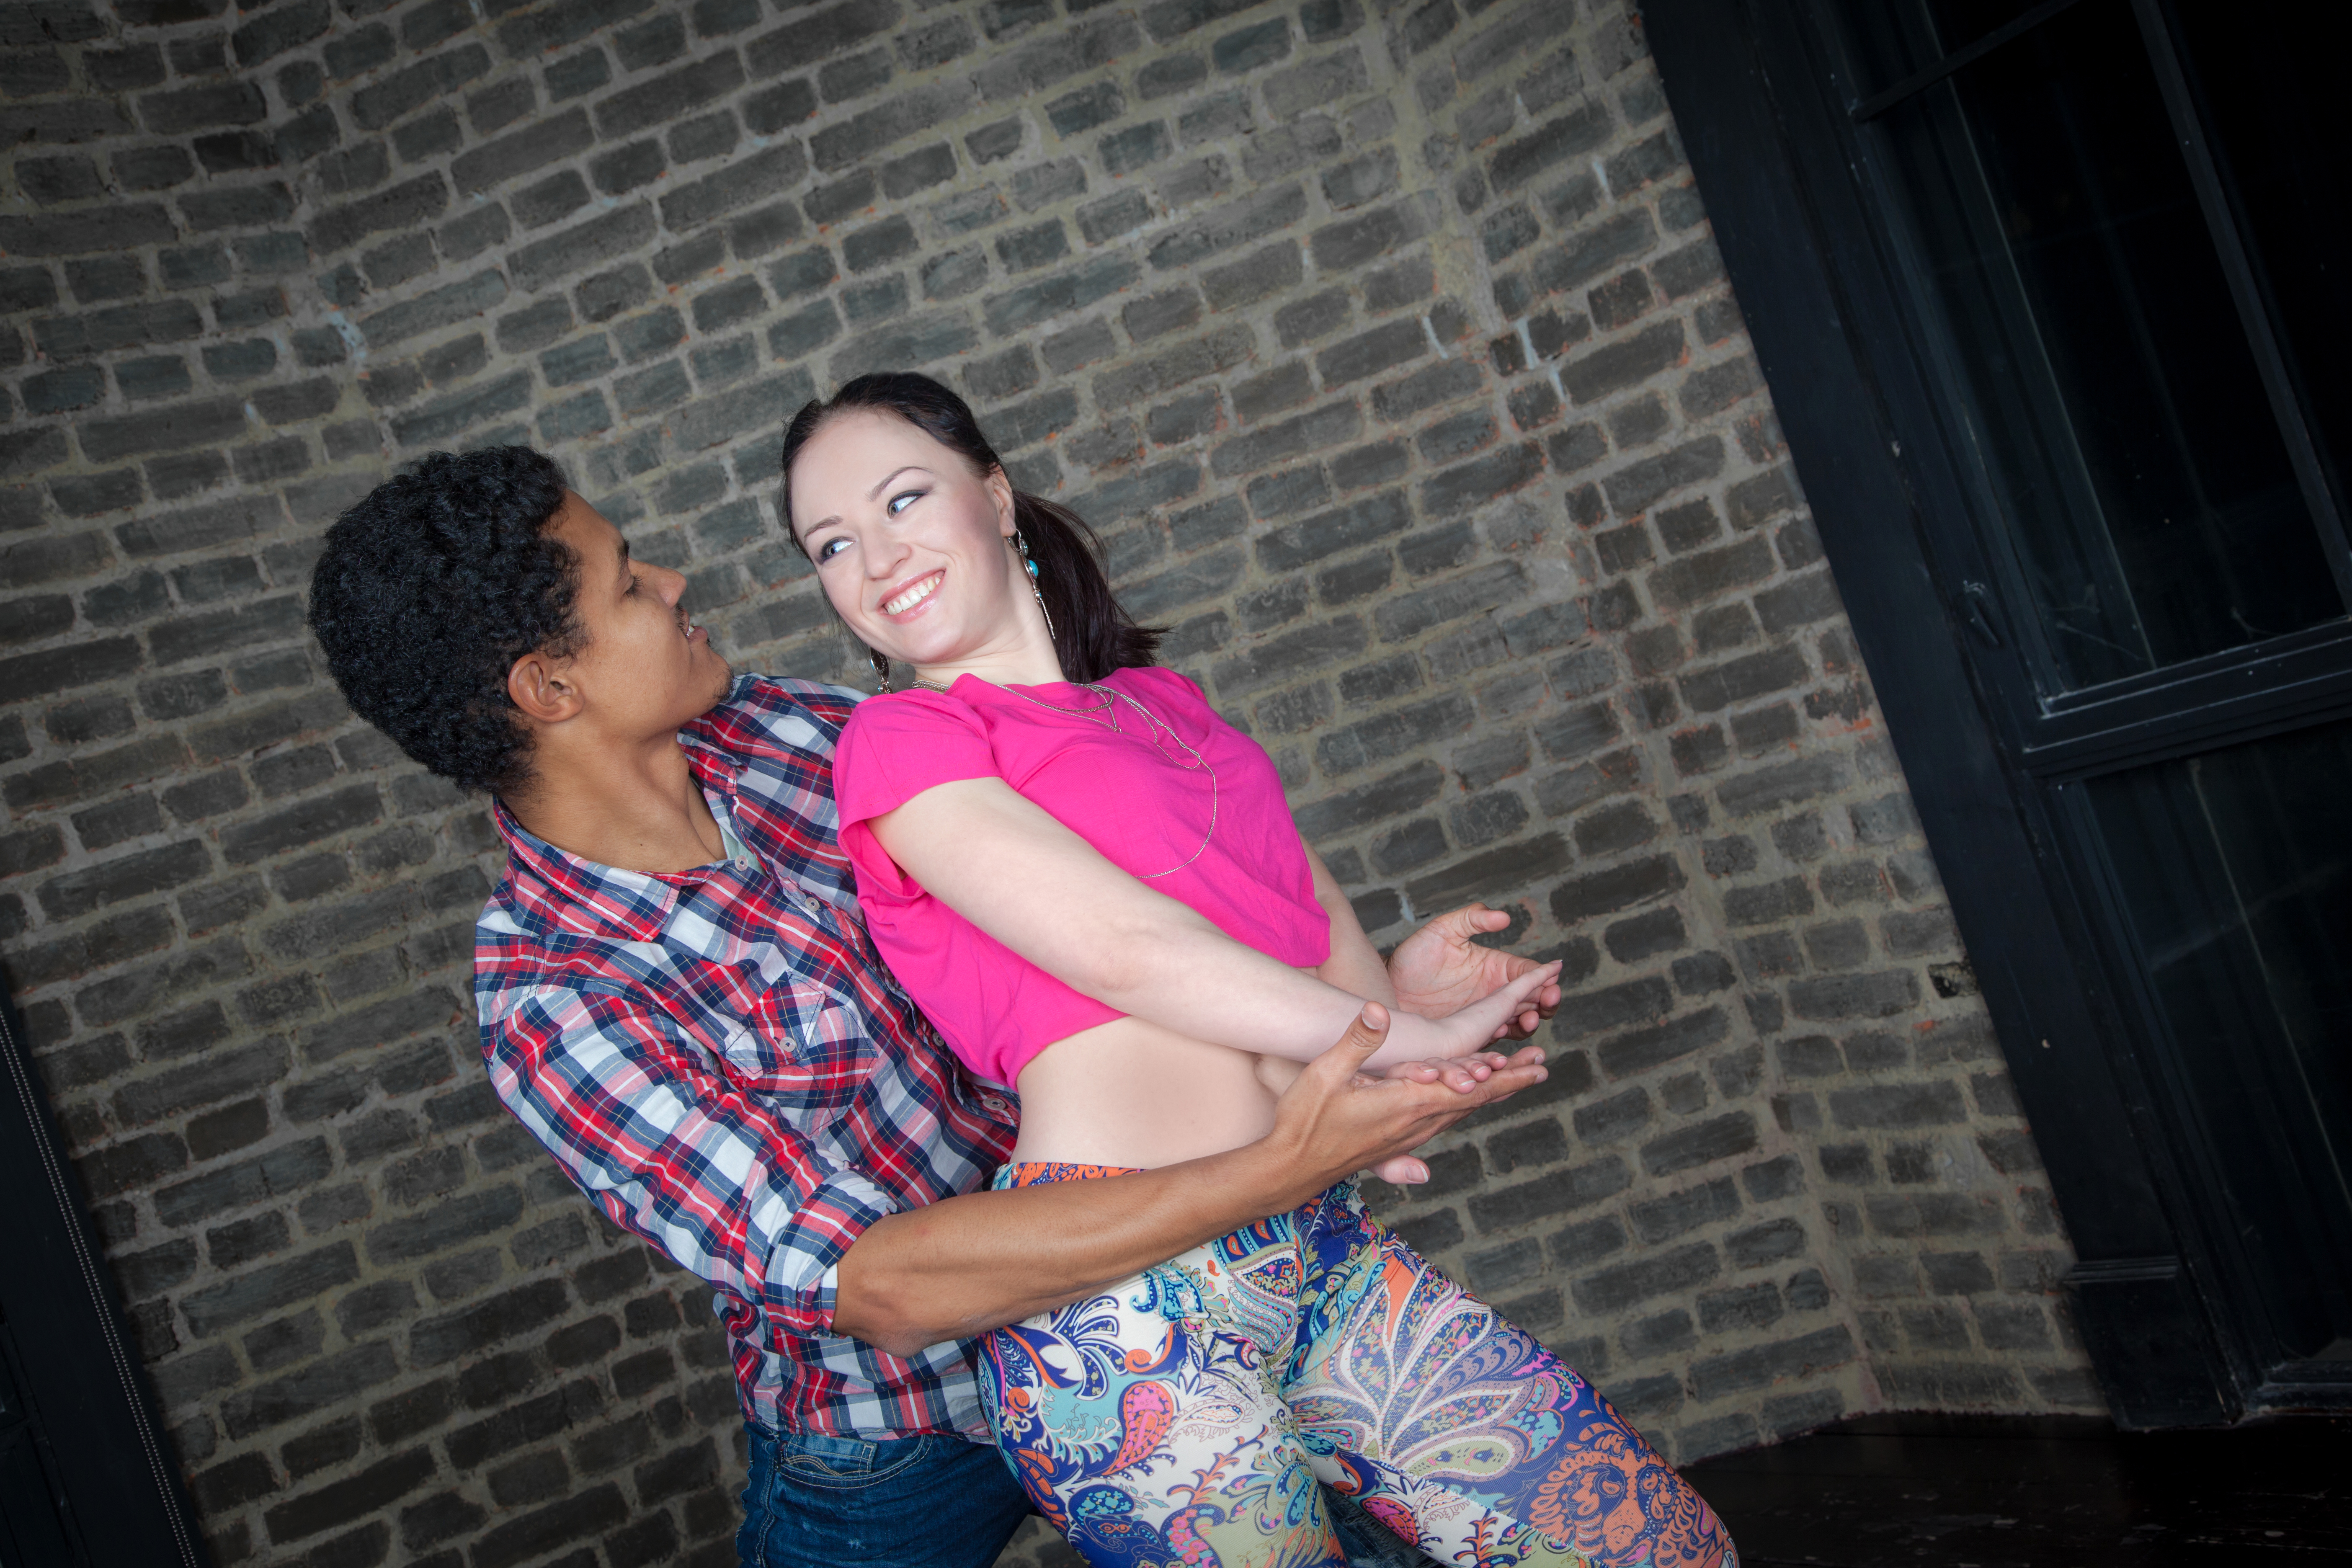 танцы, парные танцы, школа танцев, сальса, бачата, кизомба, бути, латина, растяжка, стретчинг,  salsa, bachata. kizomba, бачата